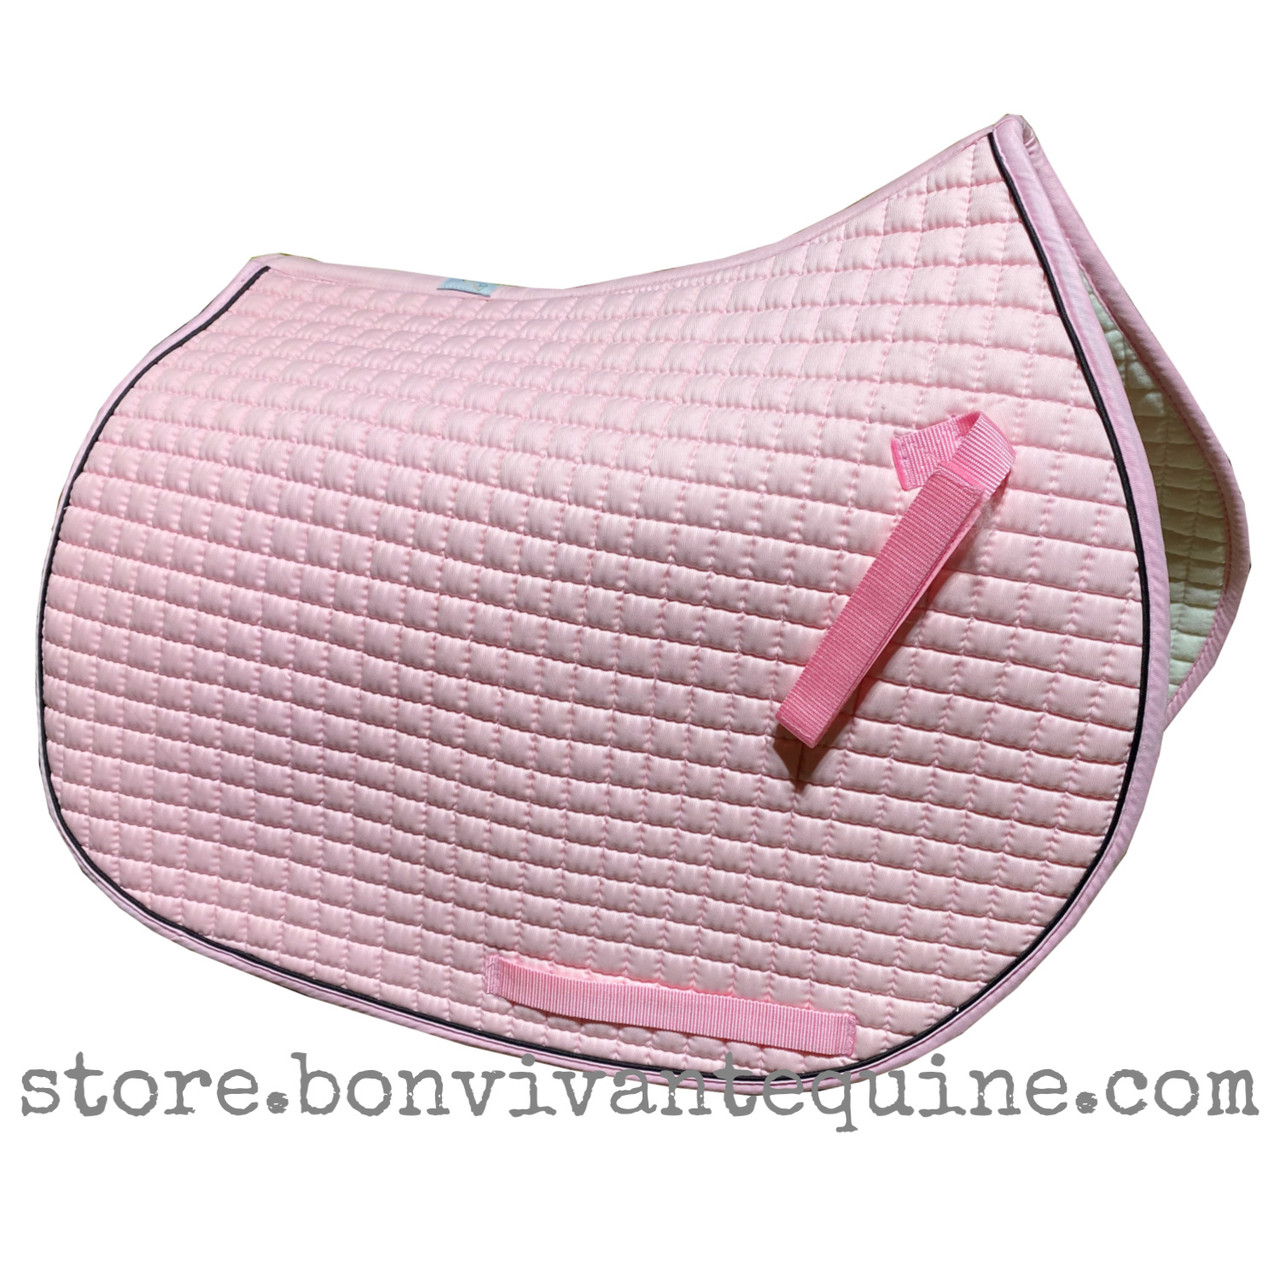 Baby Pink All Purpose Saddle Pads Pri Pacific Rim International Bon Vivant Unique Equestrian Supply Accessories